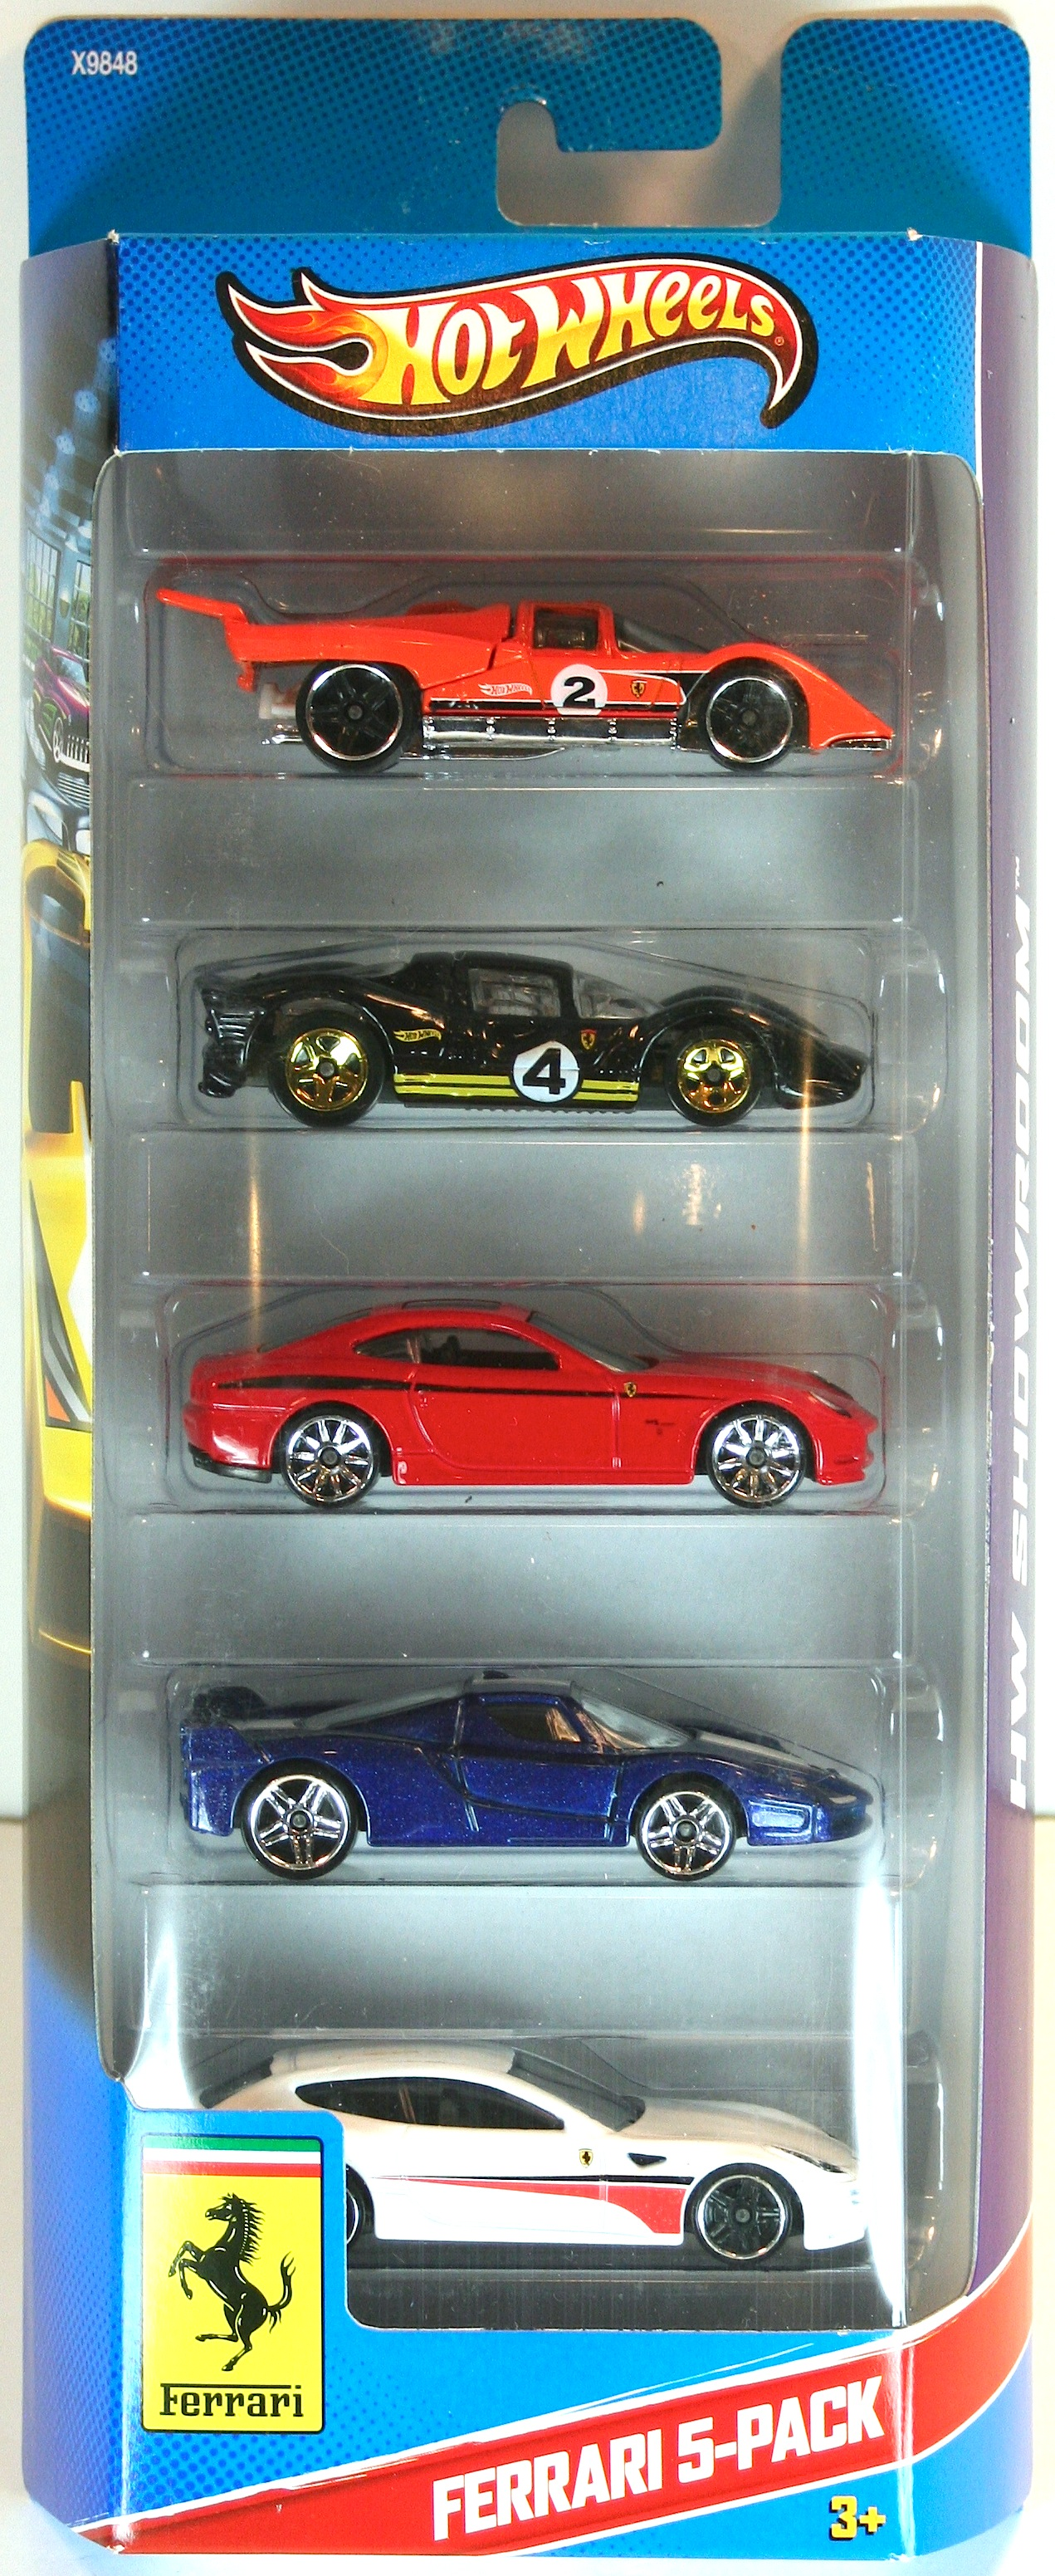 Ferrari 5-Pack (2013)